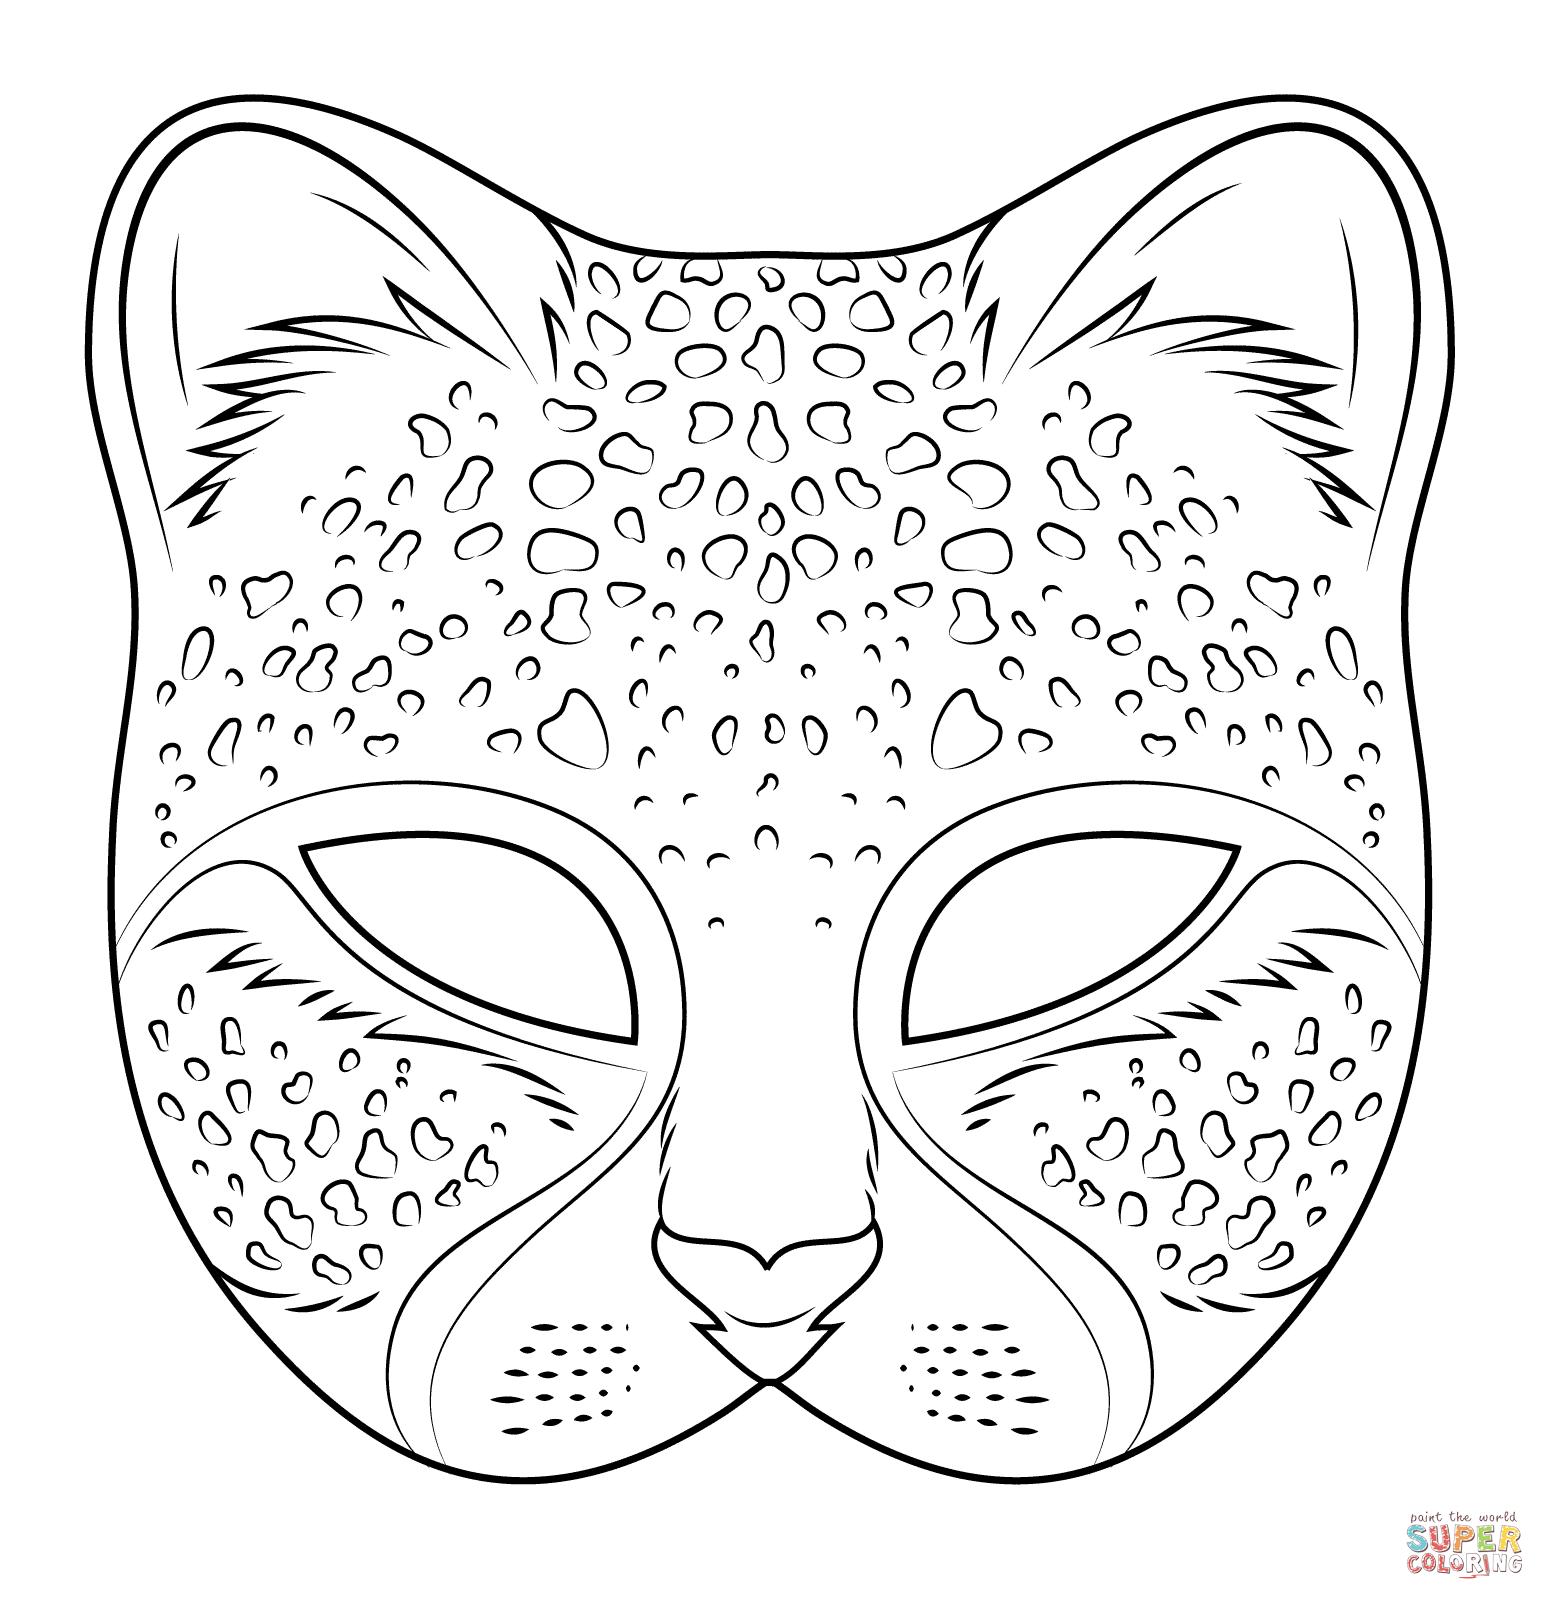 I Love Coloring Ii Cheetah Mask Icolor The Arts